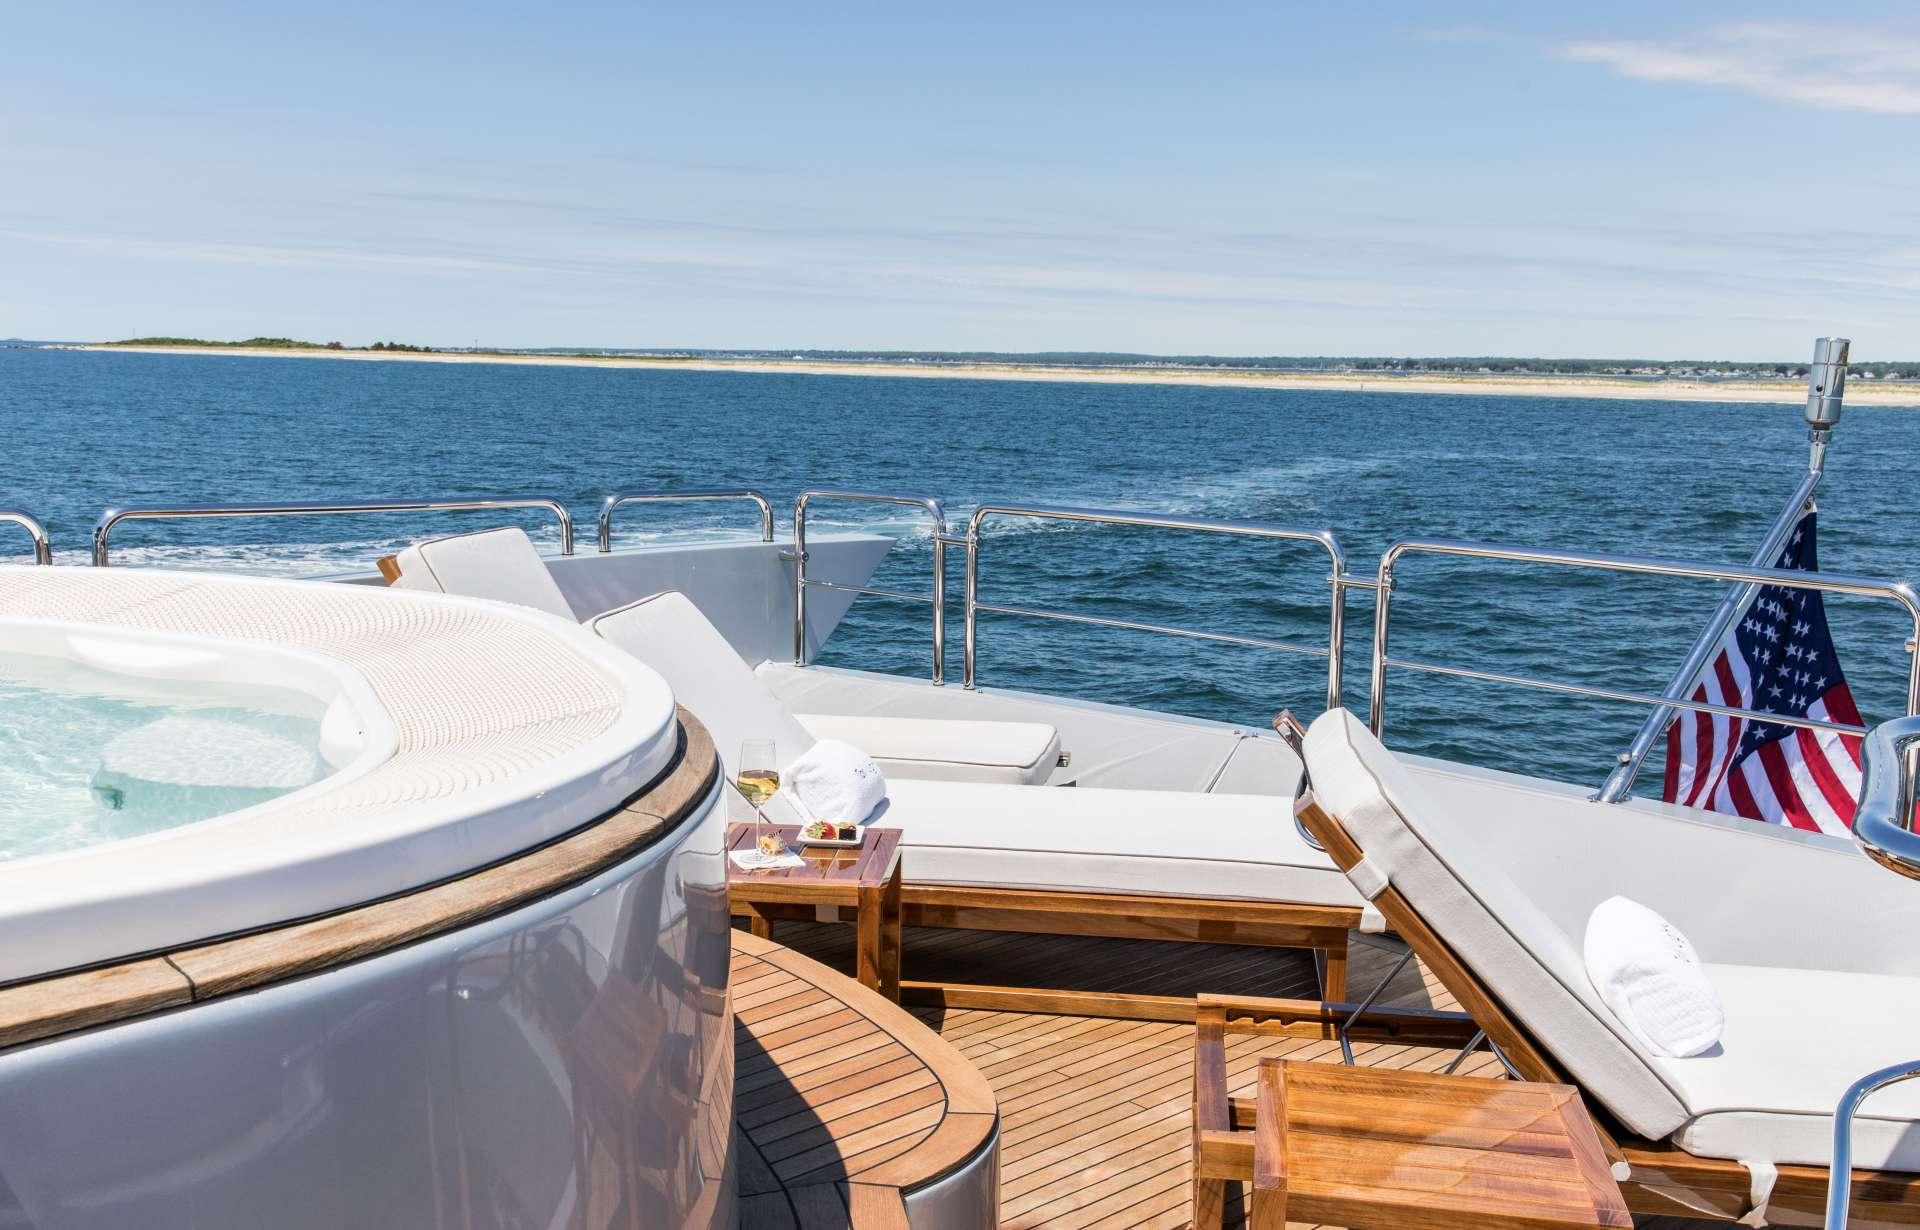 Motor Yacht 'TAIL LIGHTS' Sun loungers Flybridge Aft, 12 PAX, 6 Crew, 116.00 Ft, 35.00 Meters, Built 2011, Azimut, Refit Year 2016